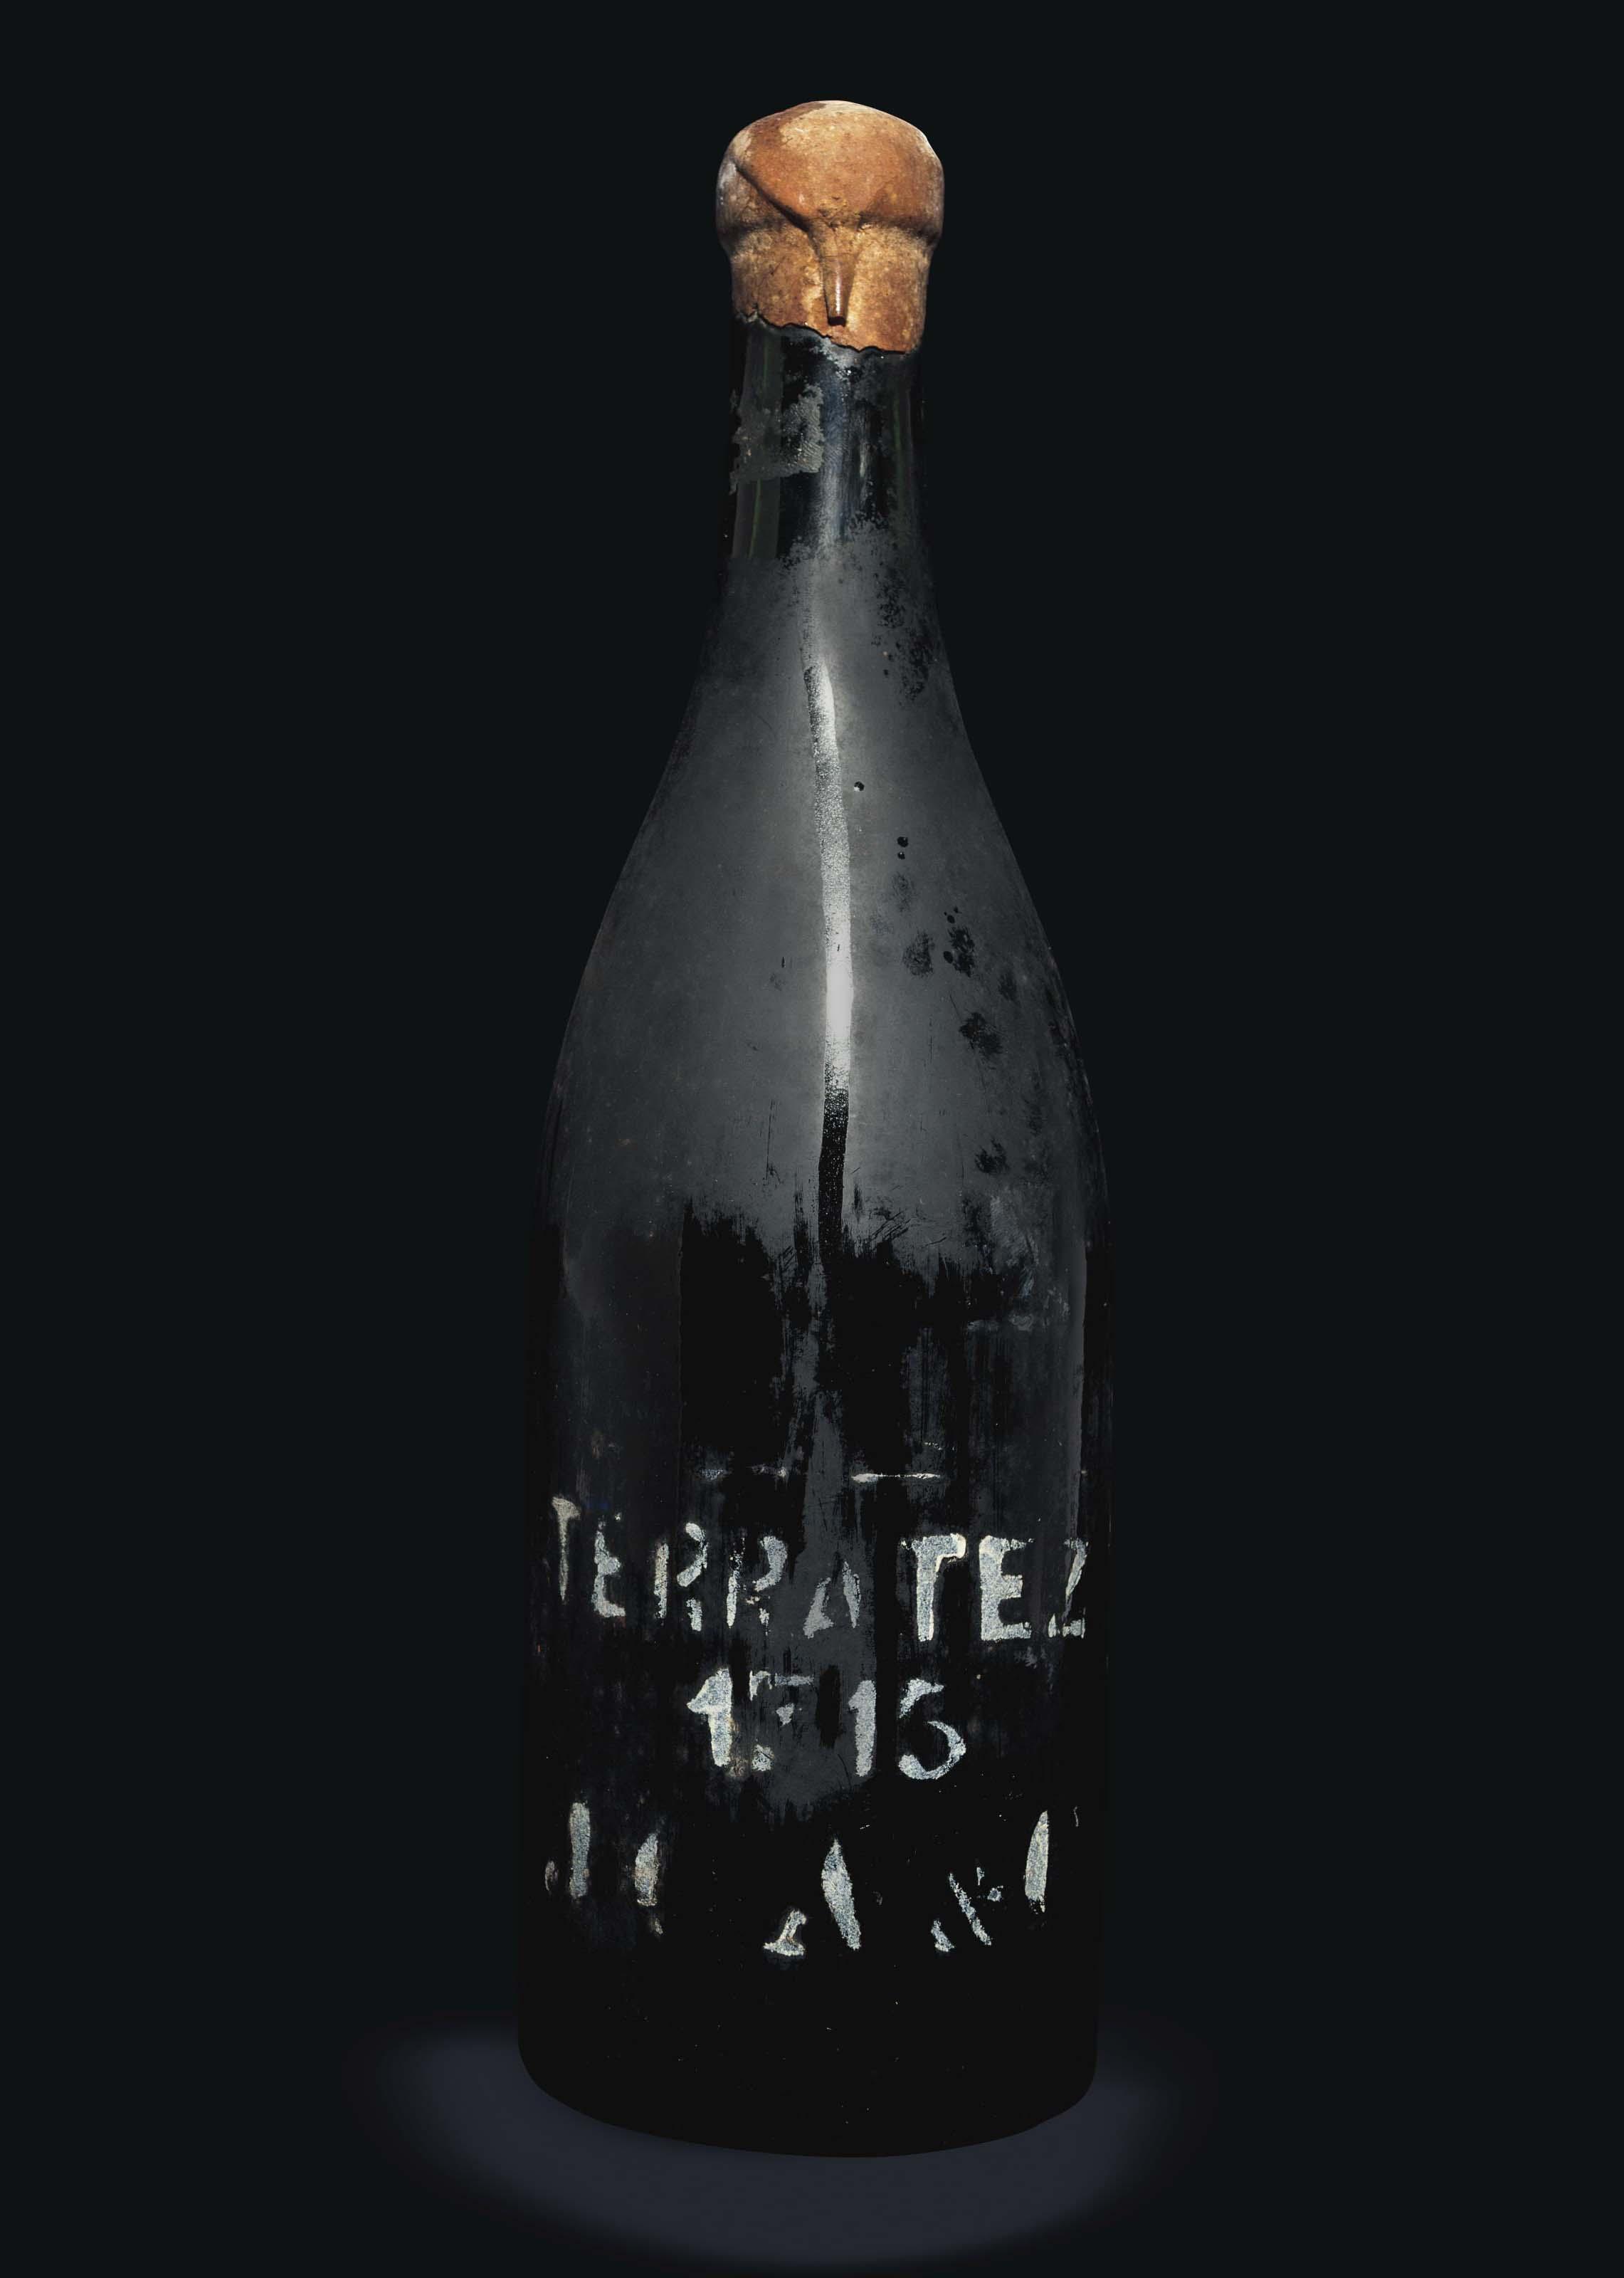 JCA & C Terrantez 1715